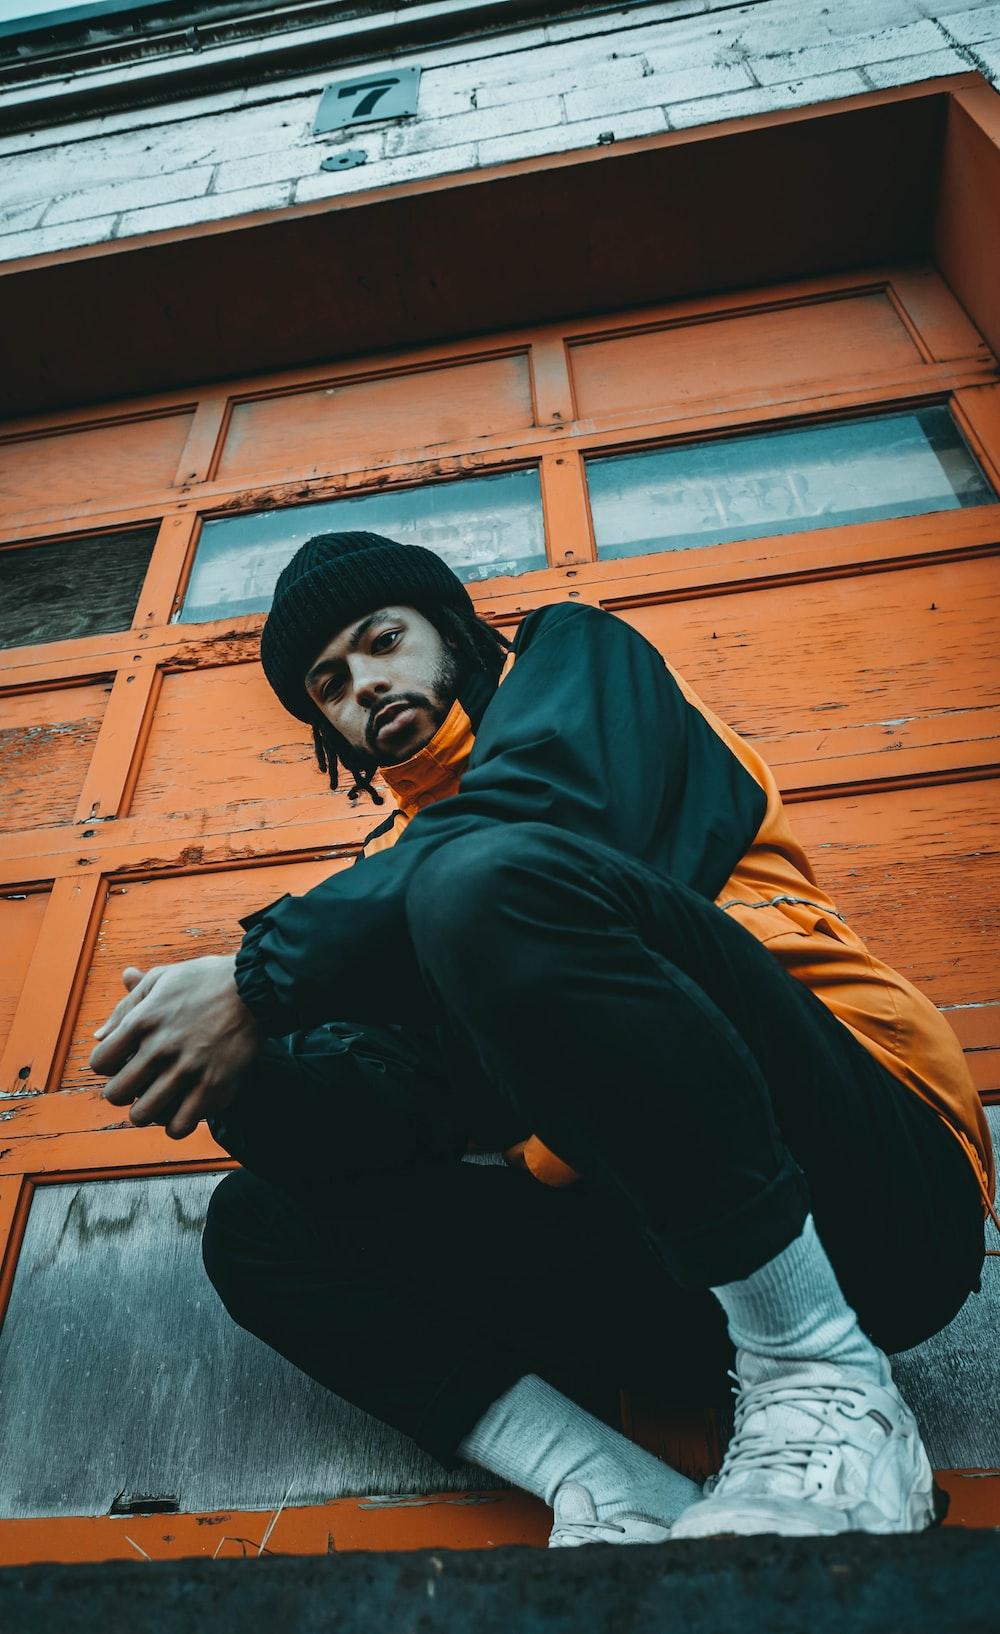 crouching man wearing black and orange jacket beside wall